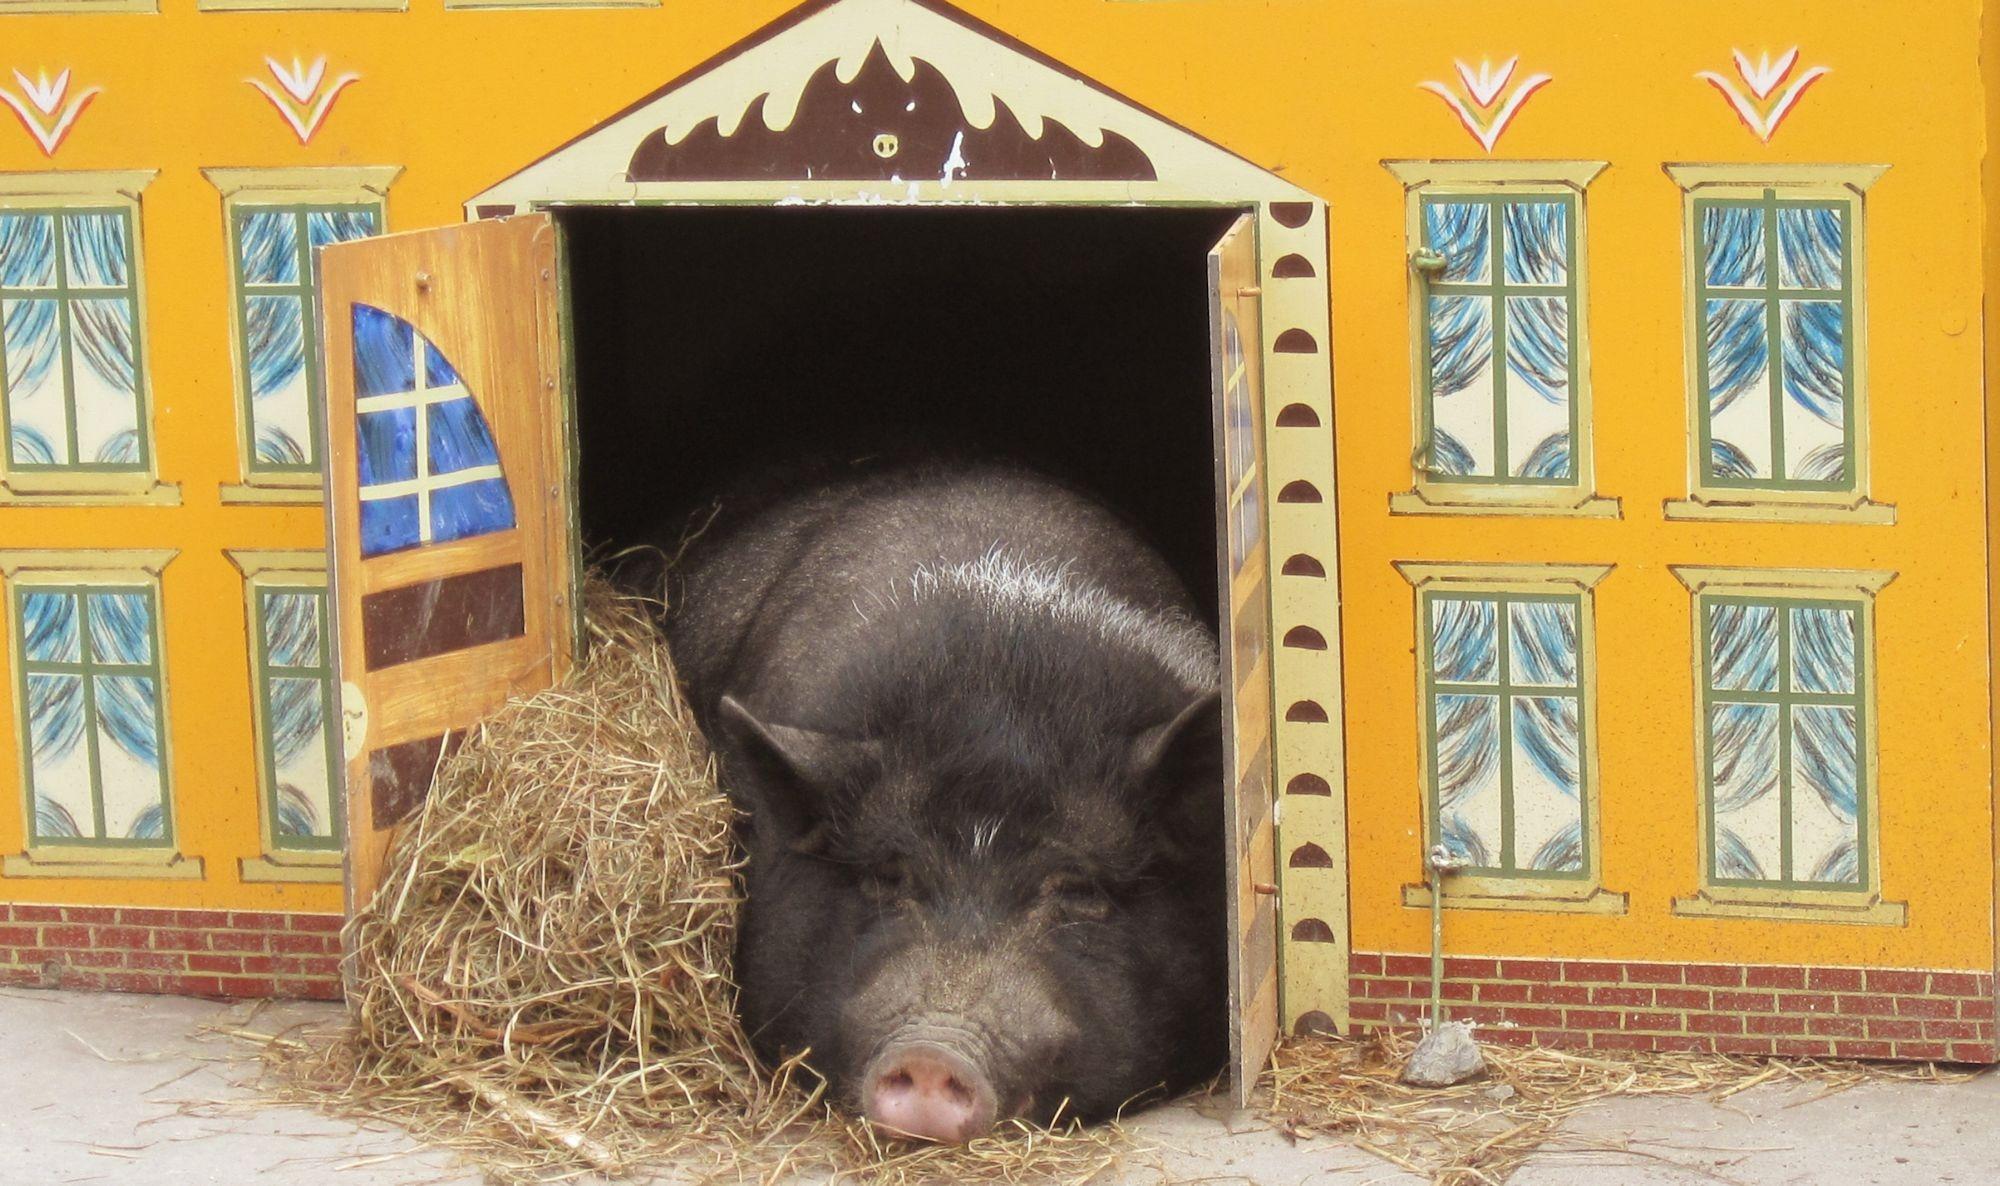 Gambar Tanah Pertanian Hewan Binatang Menyusui Sedih Anak Babi